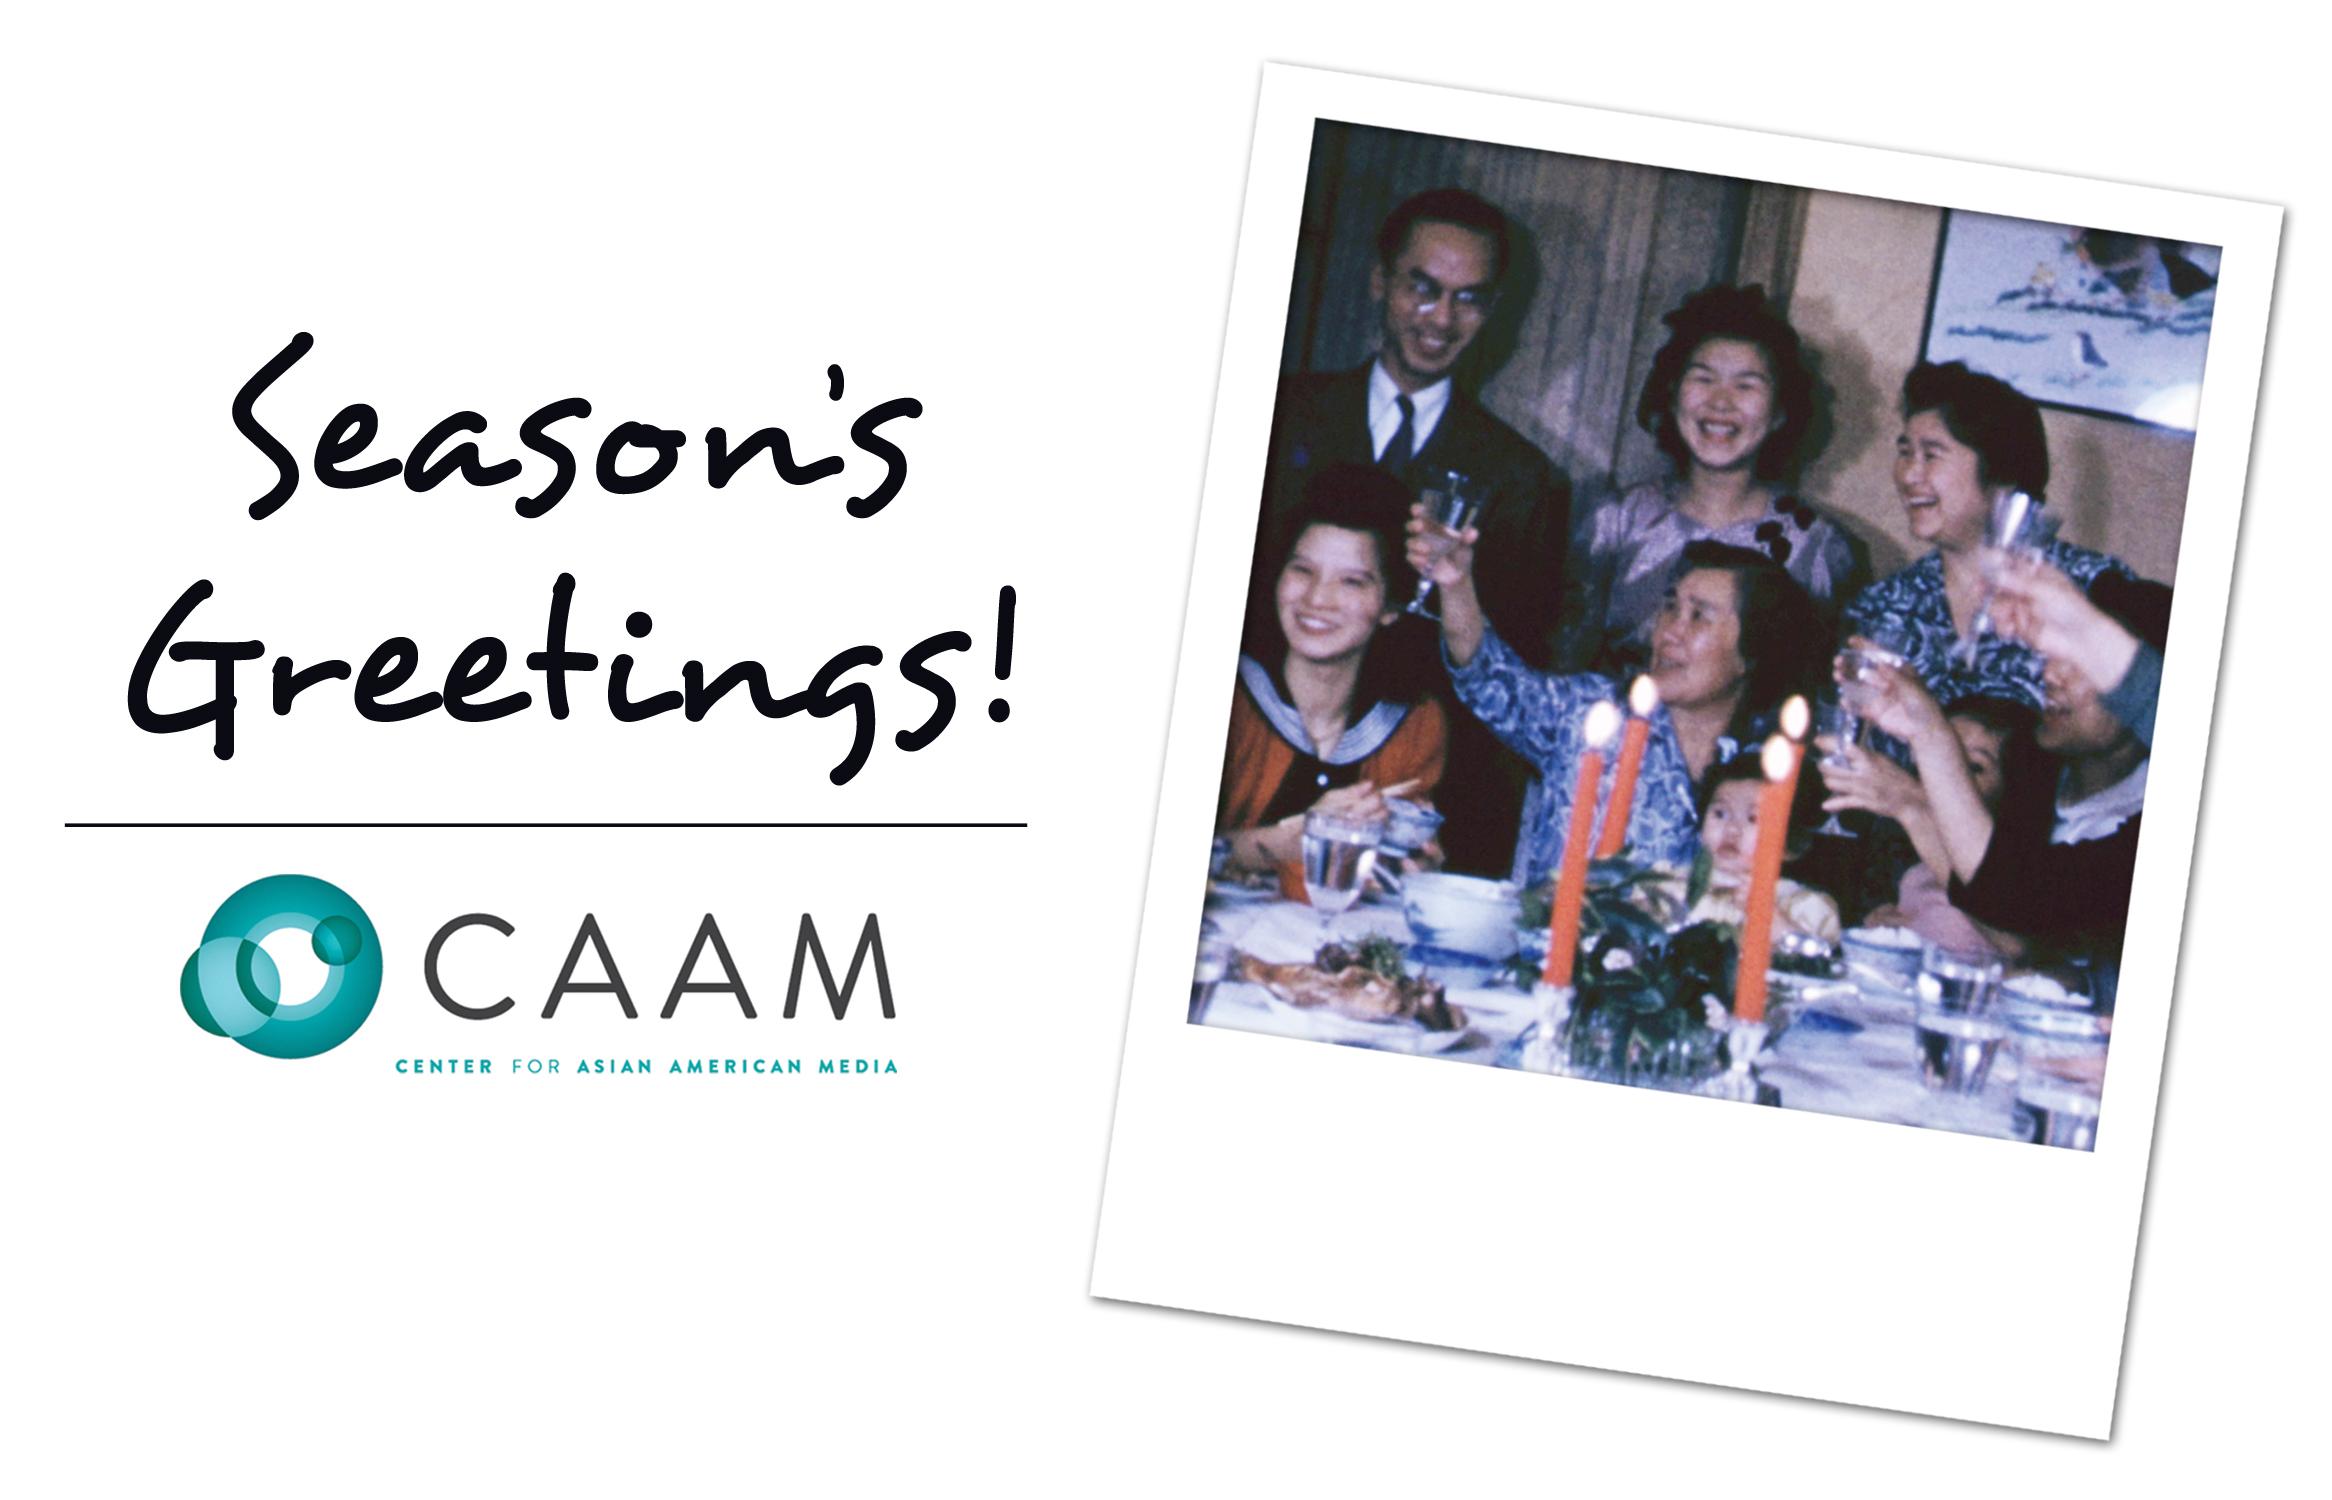 Seasons_Greetings_from_the_Center_for_Asian_American_Media_2014_v2